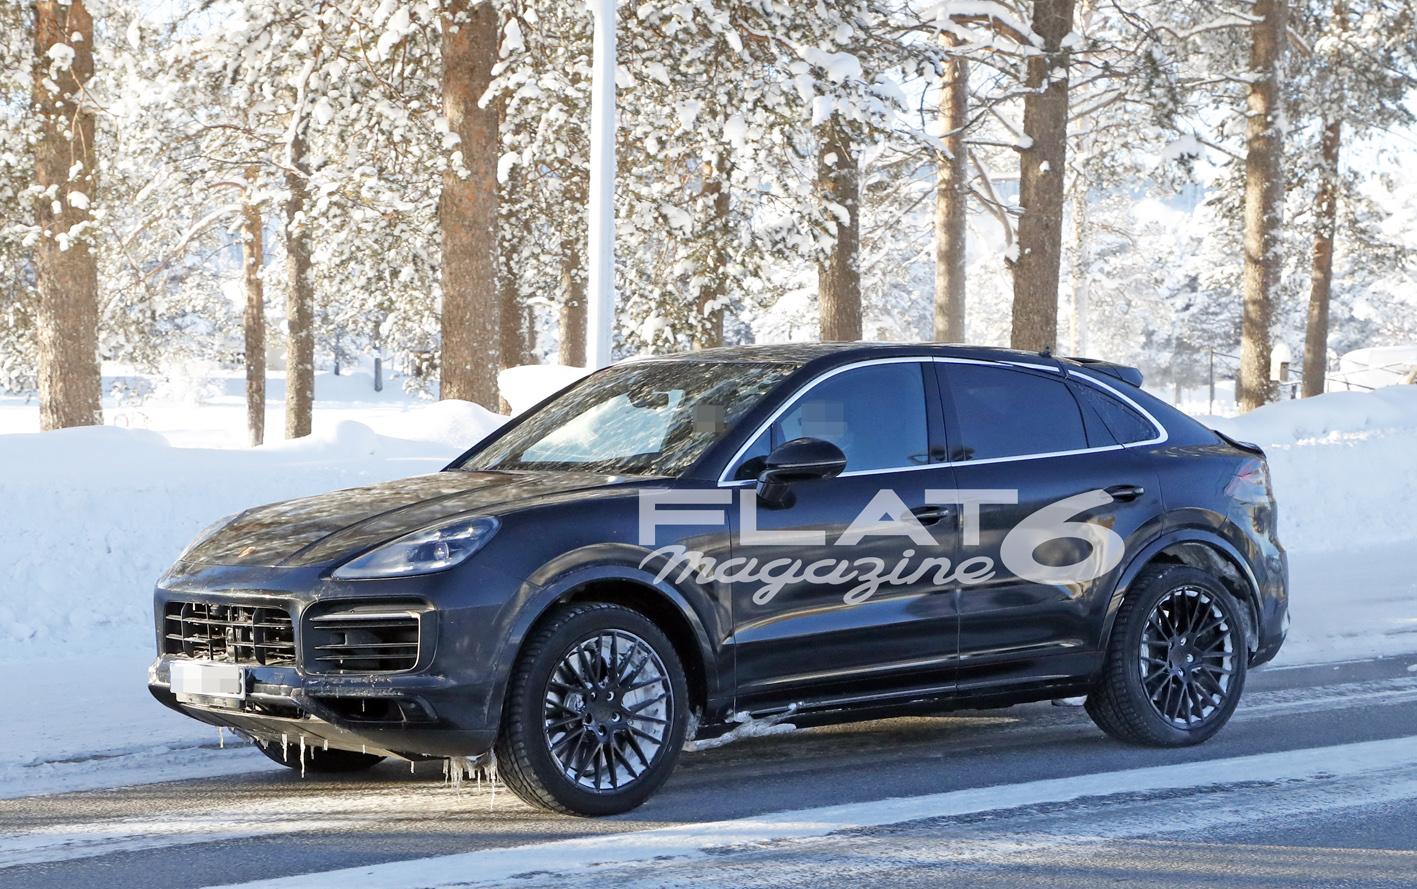 Porsche cayenne coupe winter 4 2